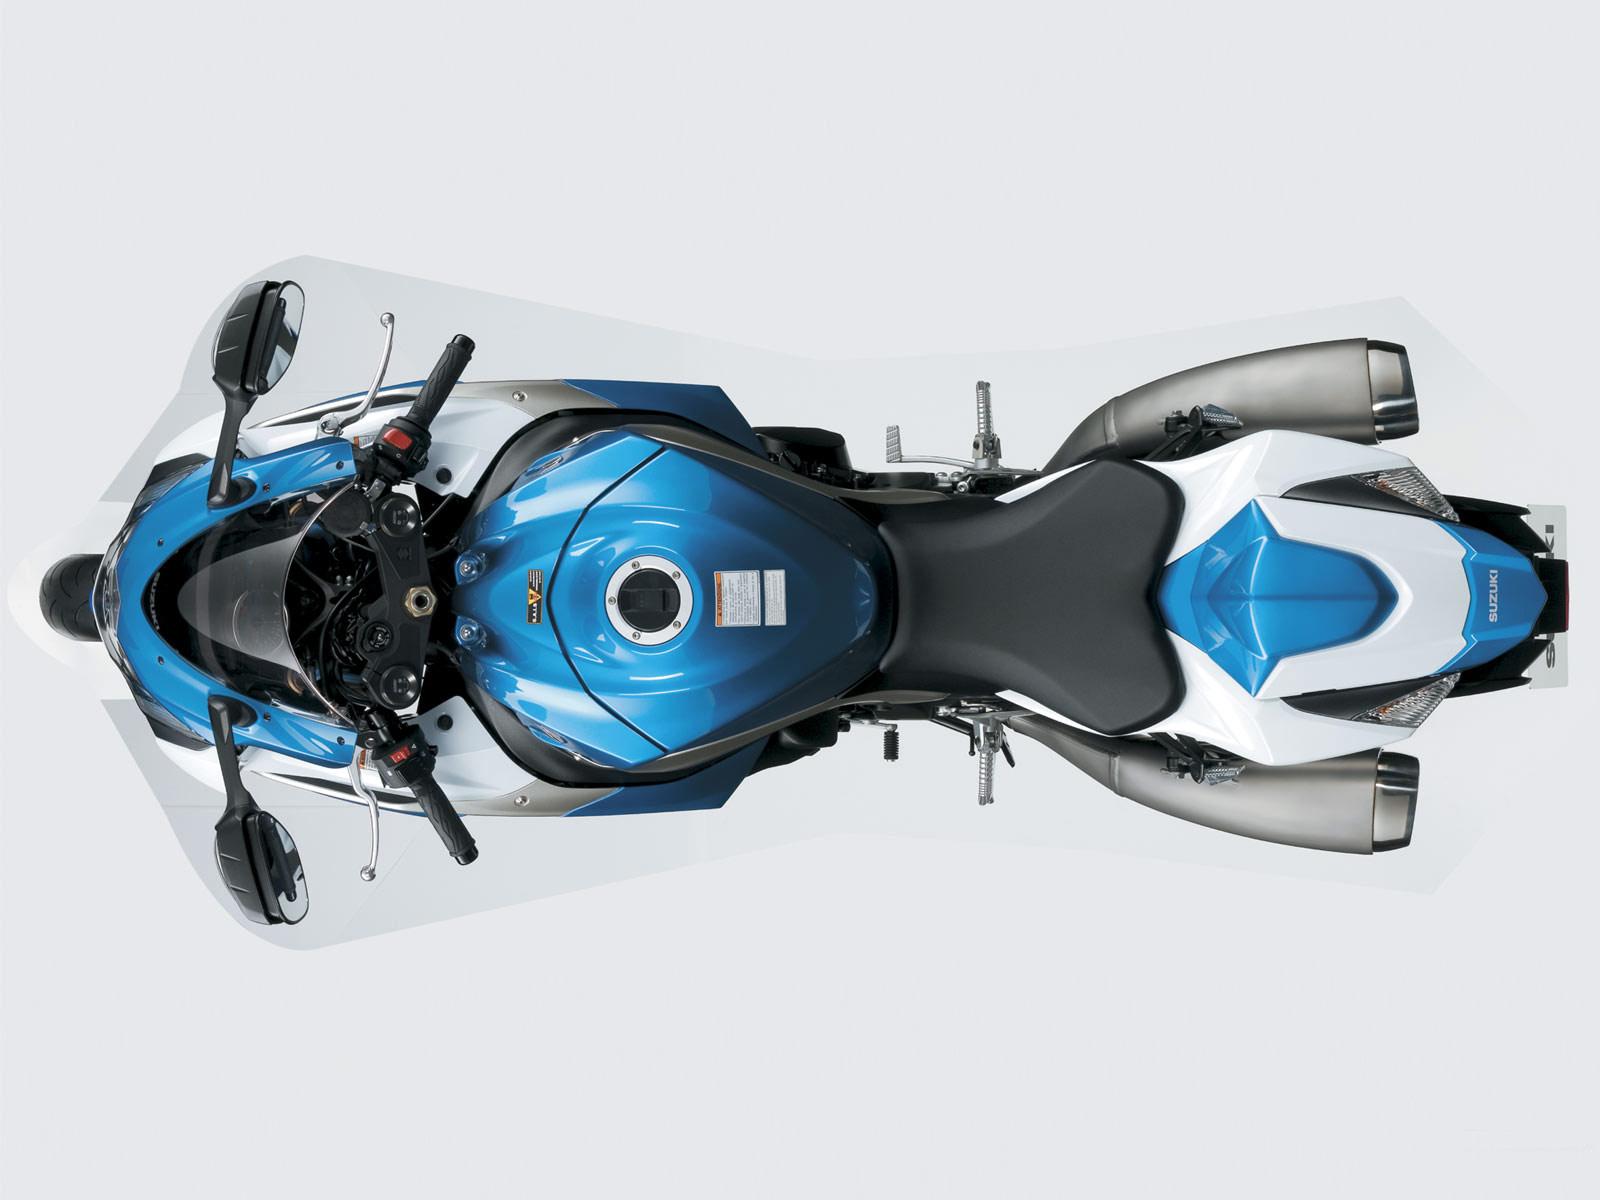 http://2.bp.blogspot.com/-QppFxFhSguc/TpzqWuA7FxI/AAAAAAAACas/n47etWbhUkY/s1600/2009_suzuki_GSX-R1000_motorcycle-desktop-wallpaper_07.jpg